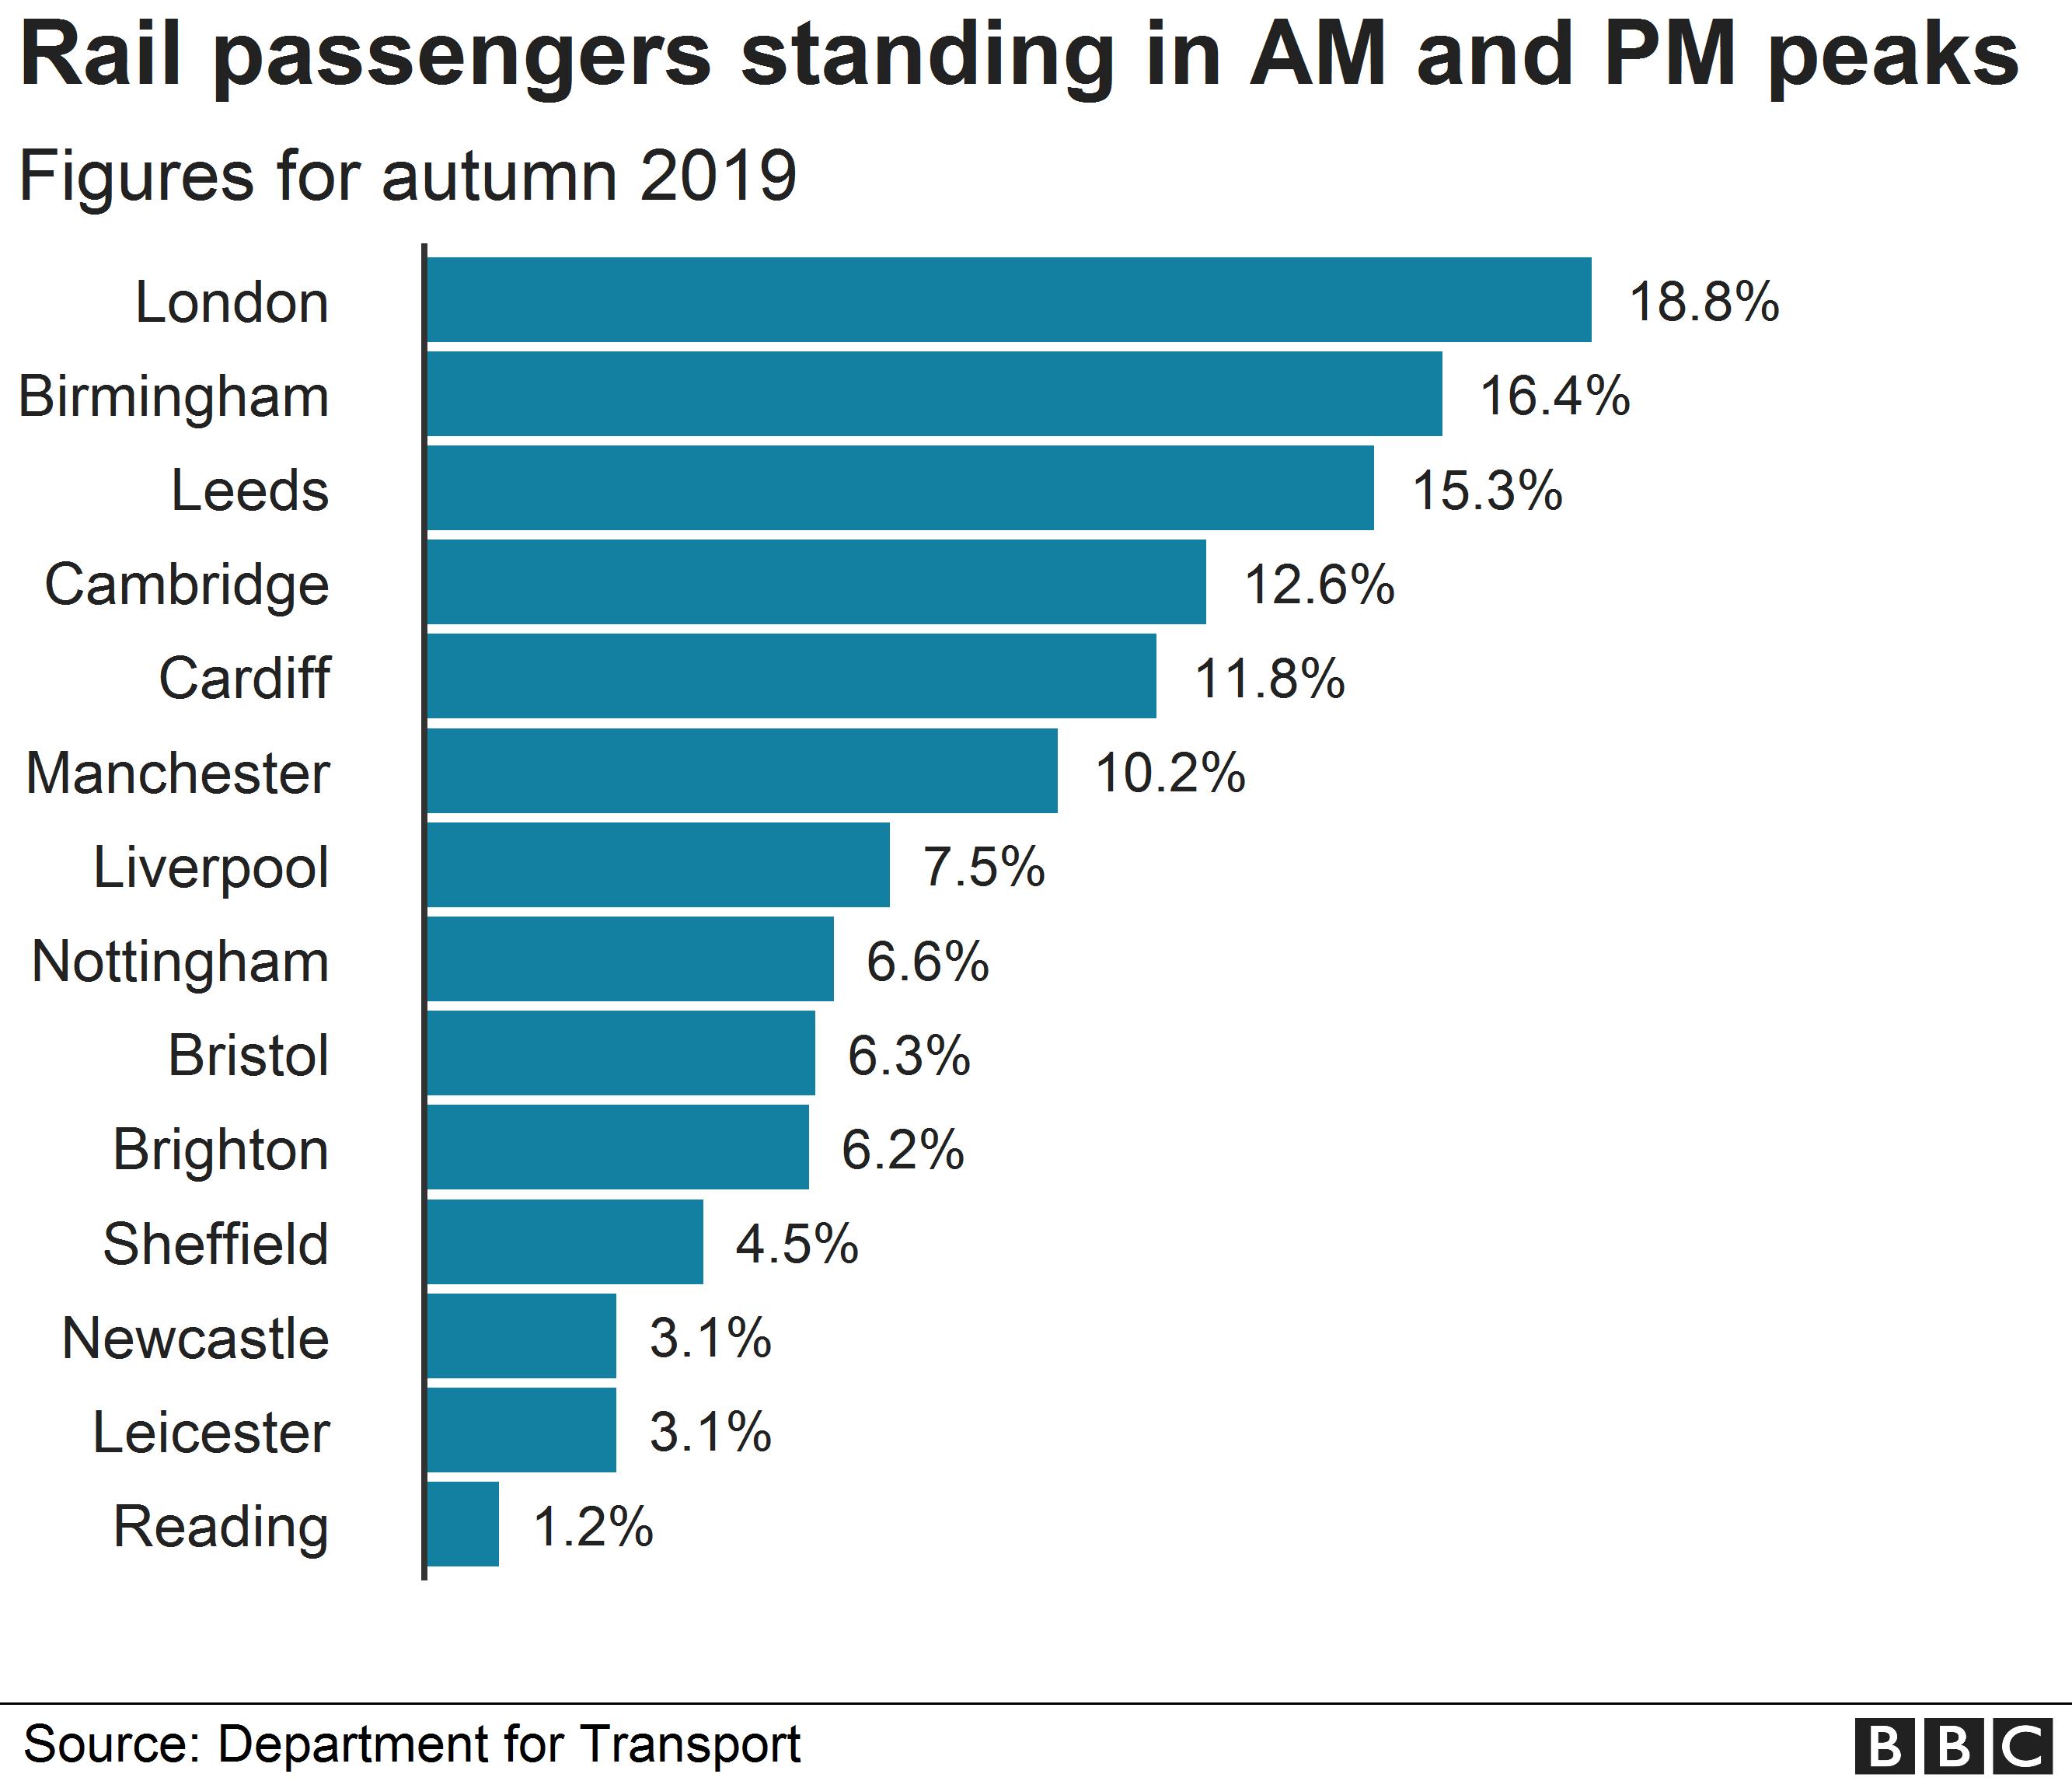 Chart showing rail passengers standing in the morning and evening peaks before coronavirus